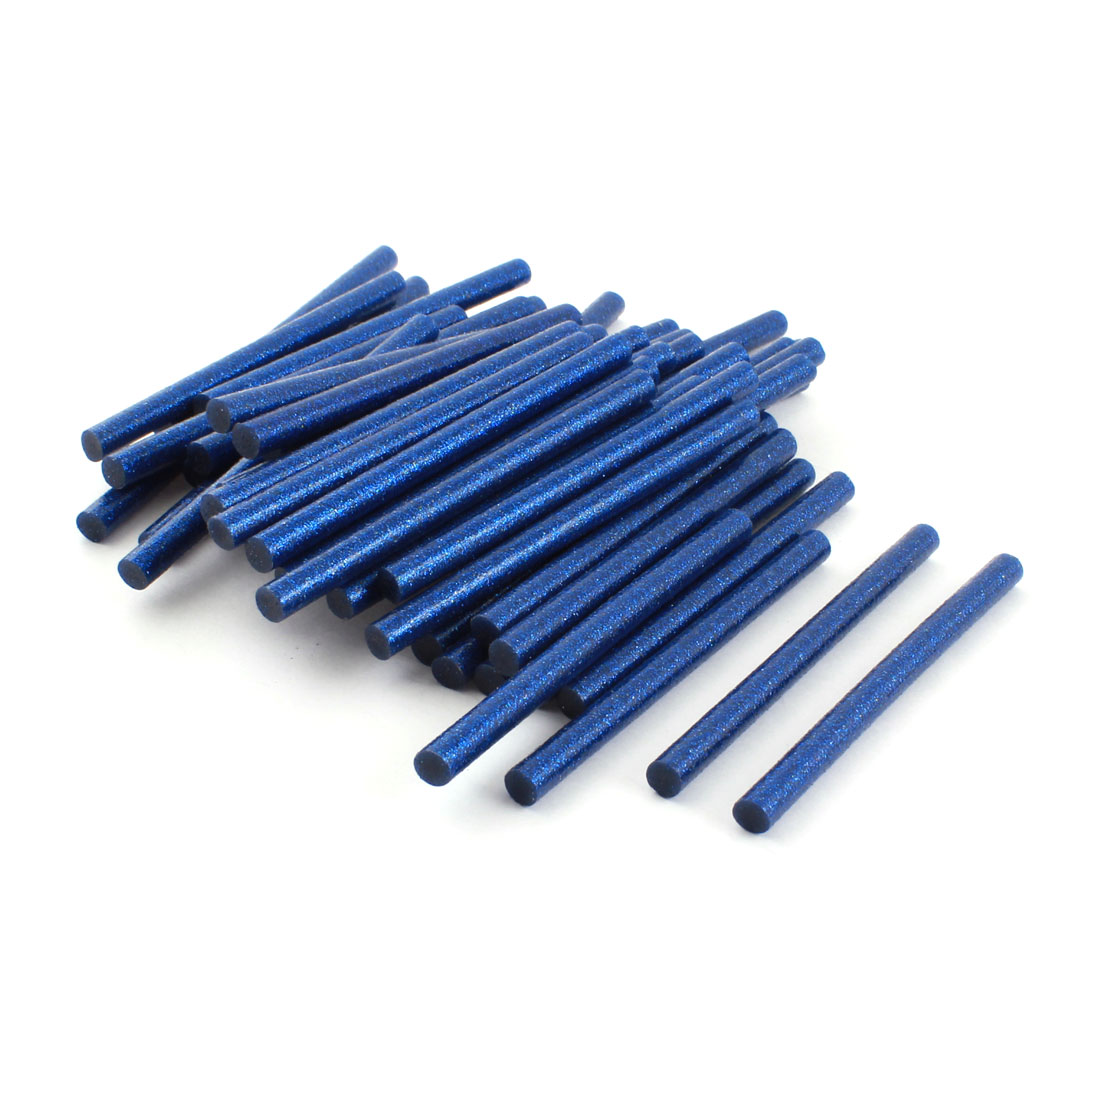 Unique Bargains 50Pcs 7mm Dia Blue Glitter Glue Adhesive Sticks 100mm for Electric Hot Melt